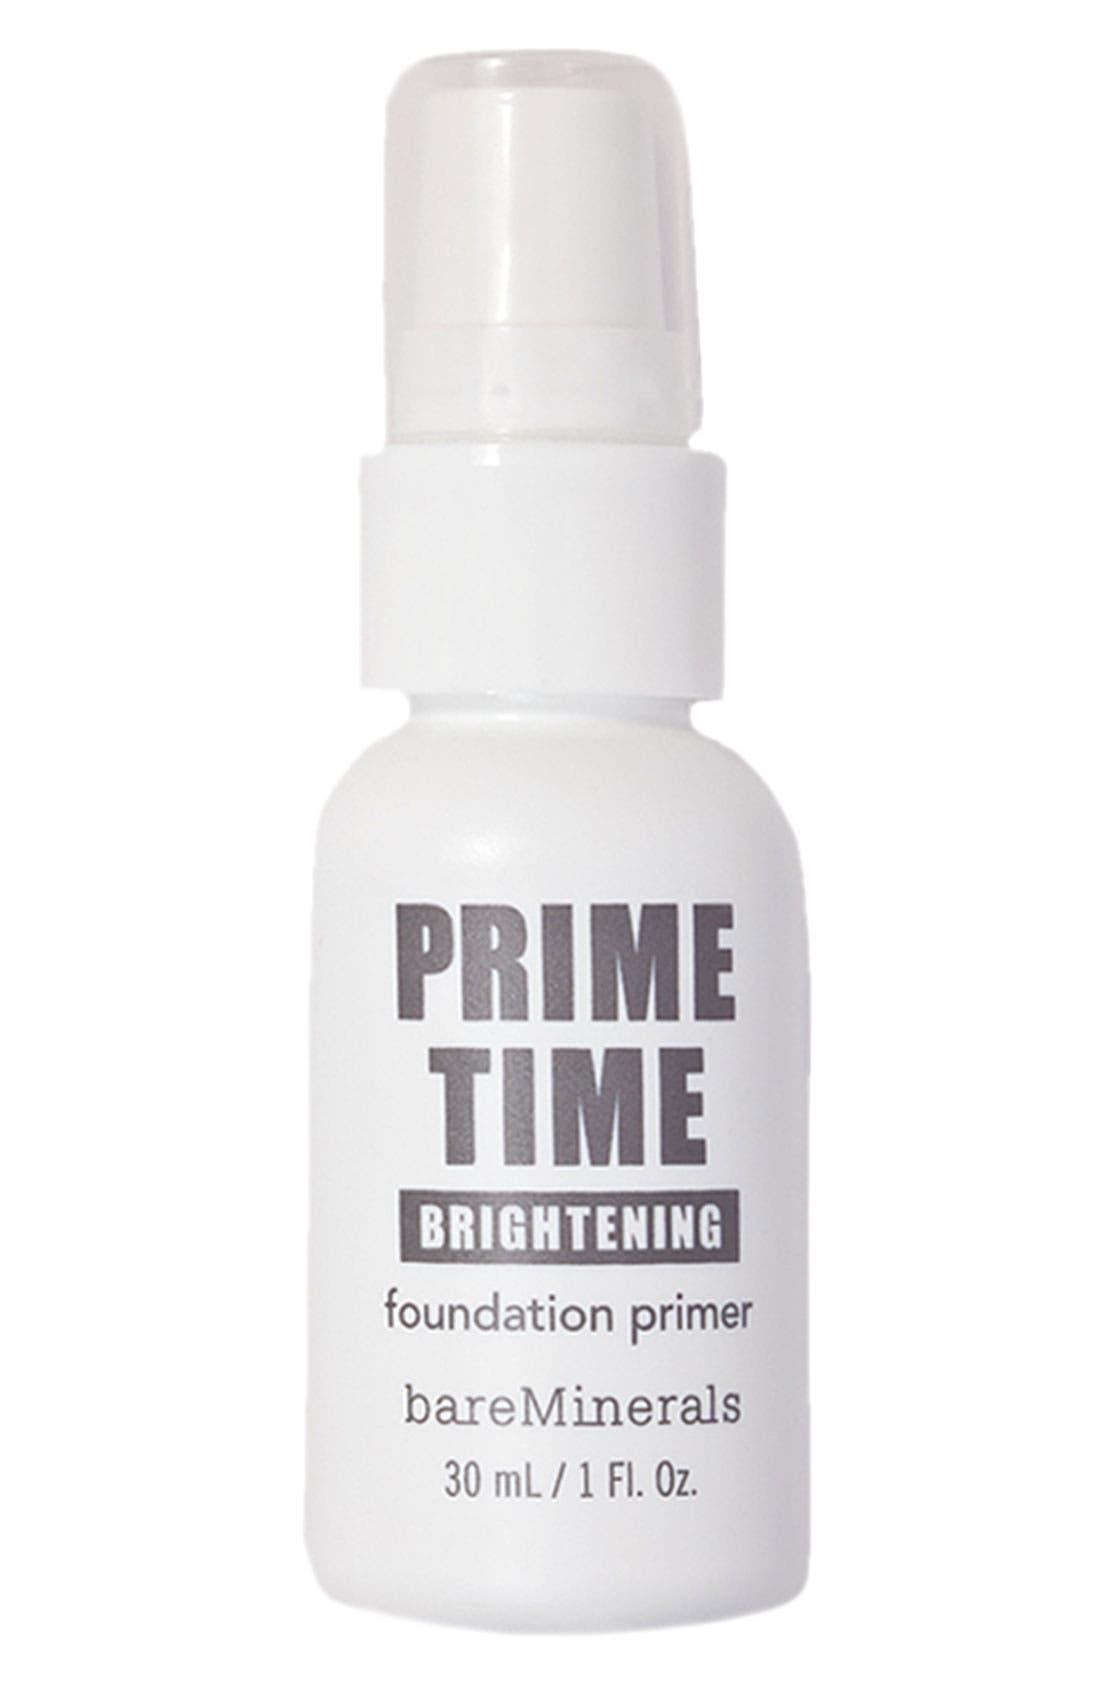 'Prime Time' Brightening Foundation Primer,                             Main thumbnail 1, color,                             000